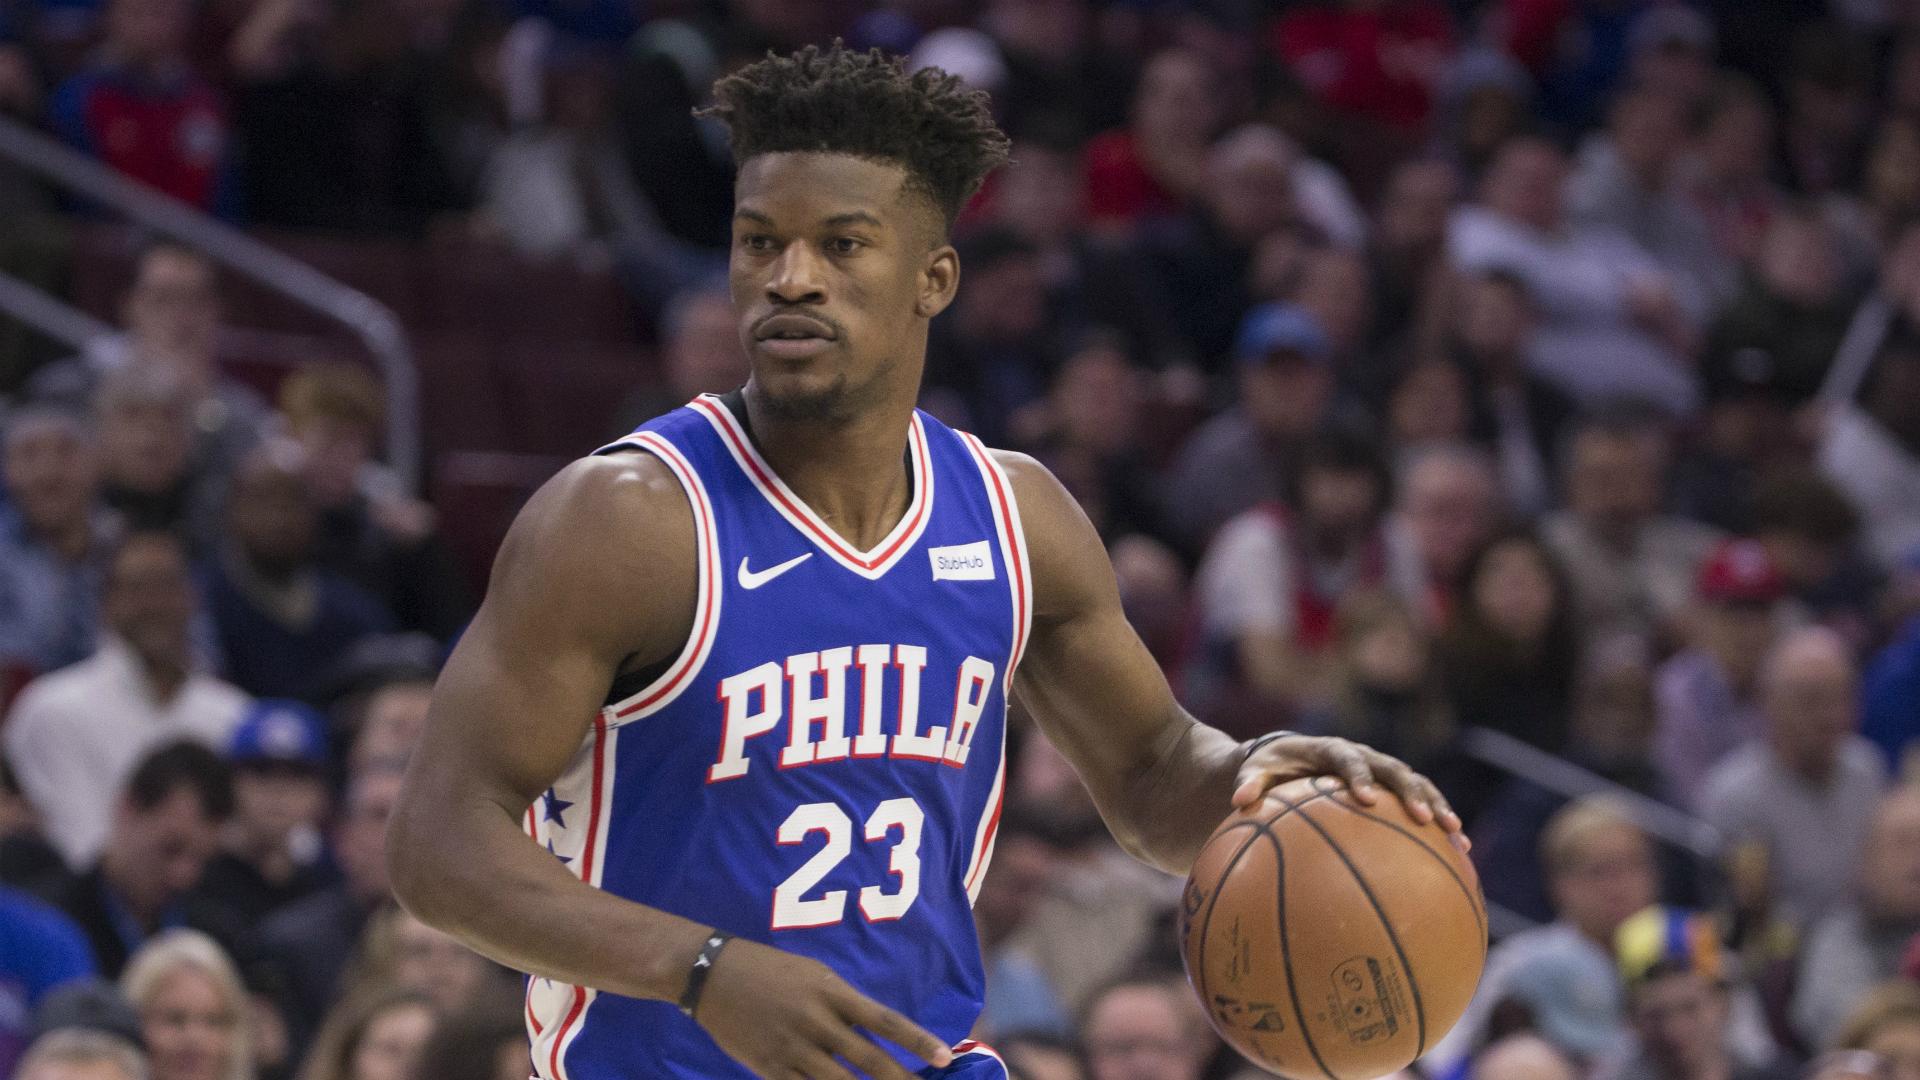 Jimmy Butler free agency rumors: Nets have a 'real shot at landing' forward